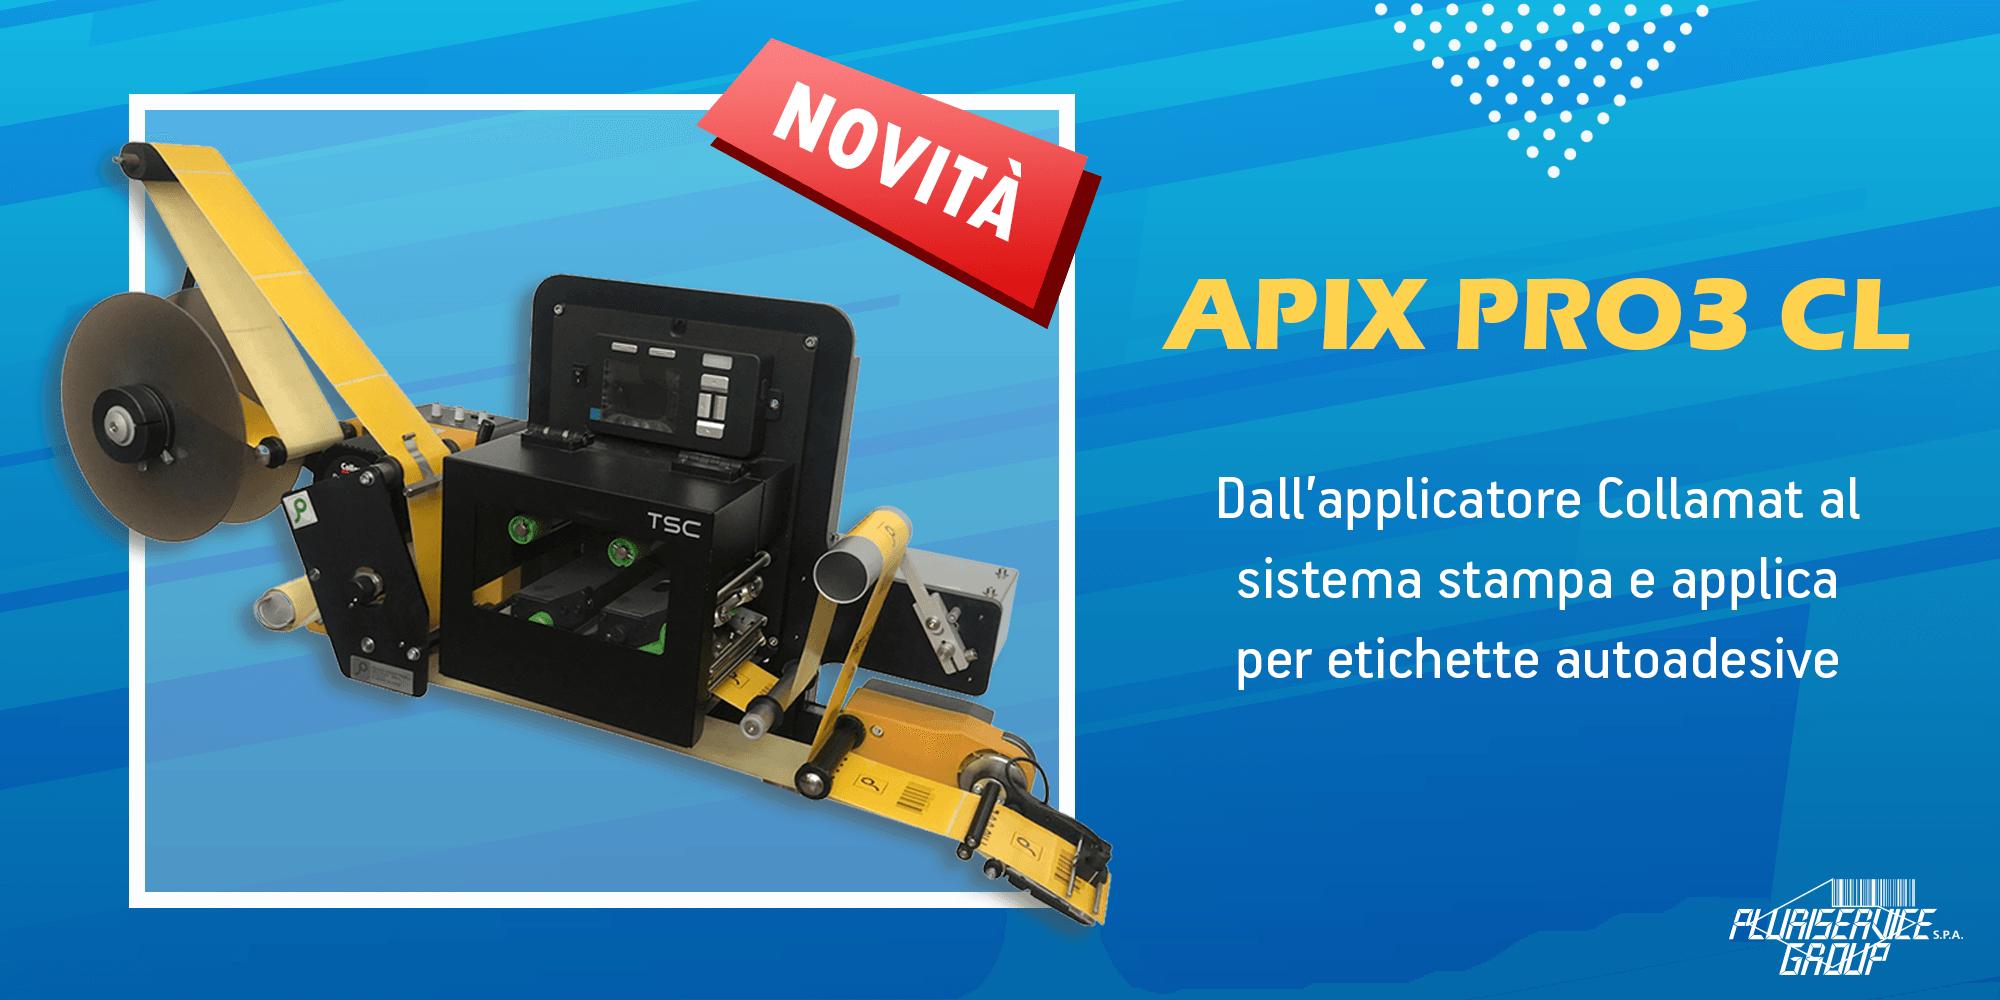 apix-pro3-cl-stampa-e-applica